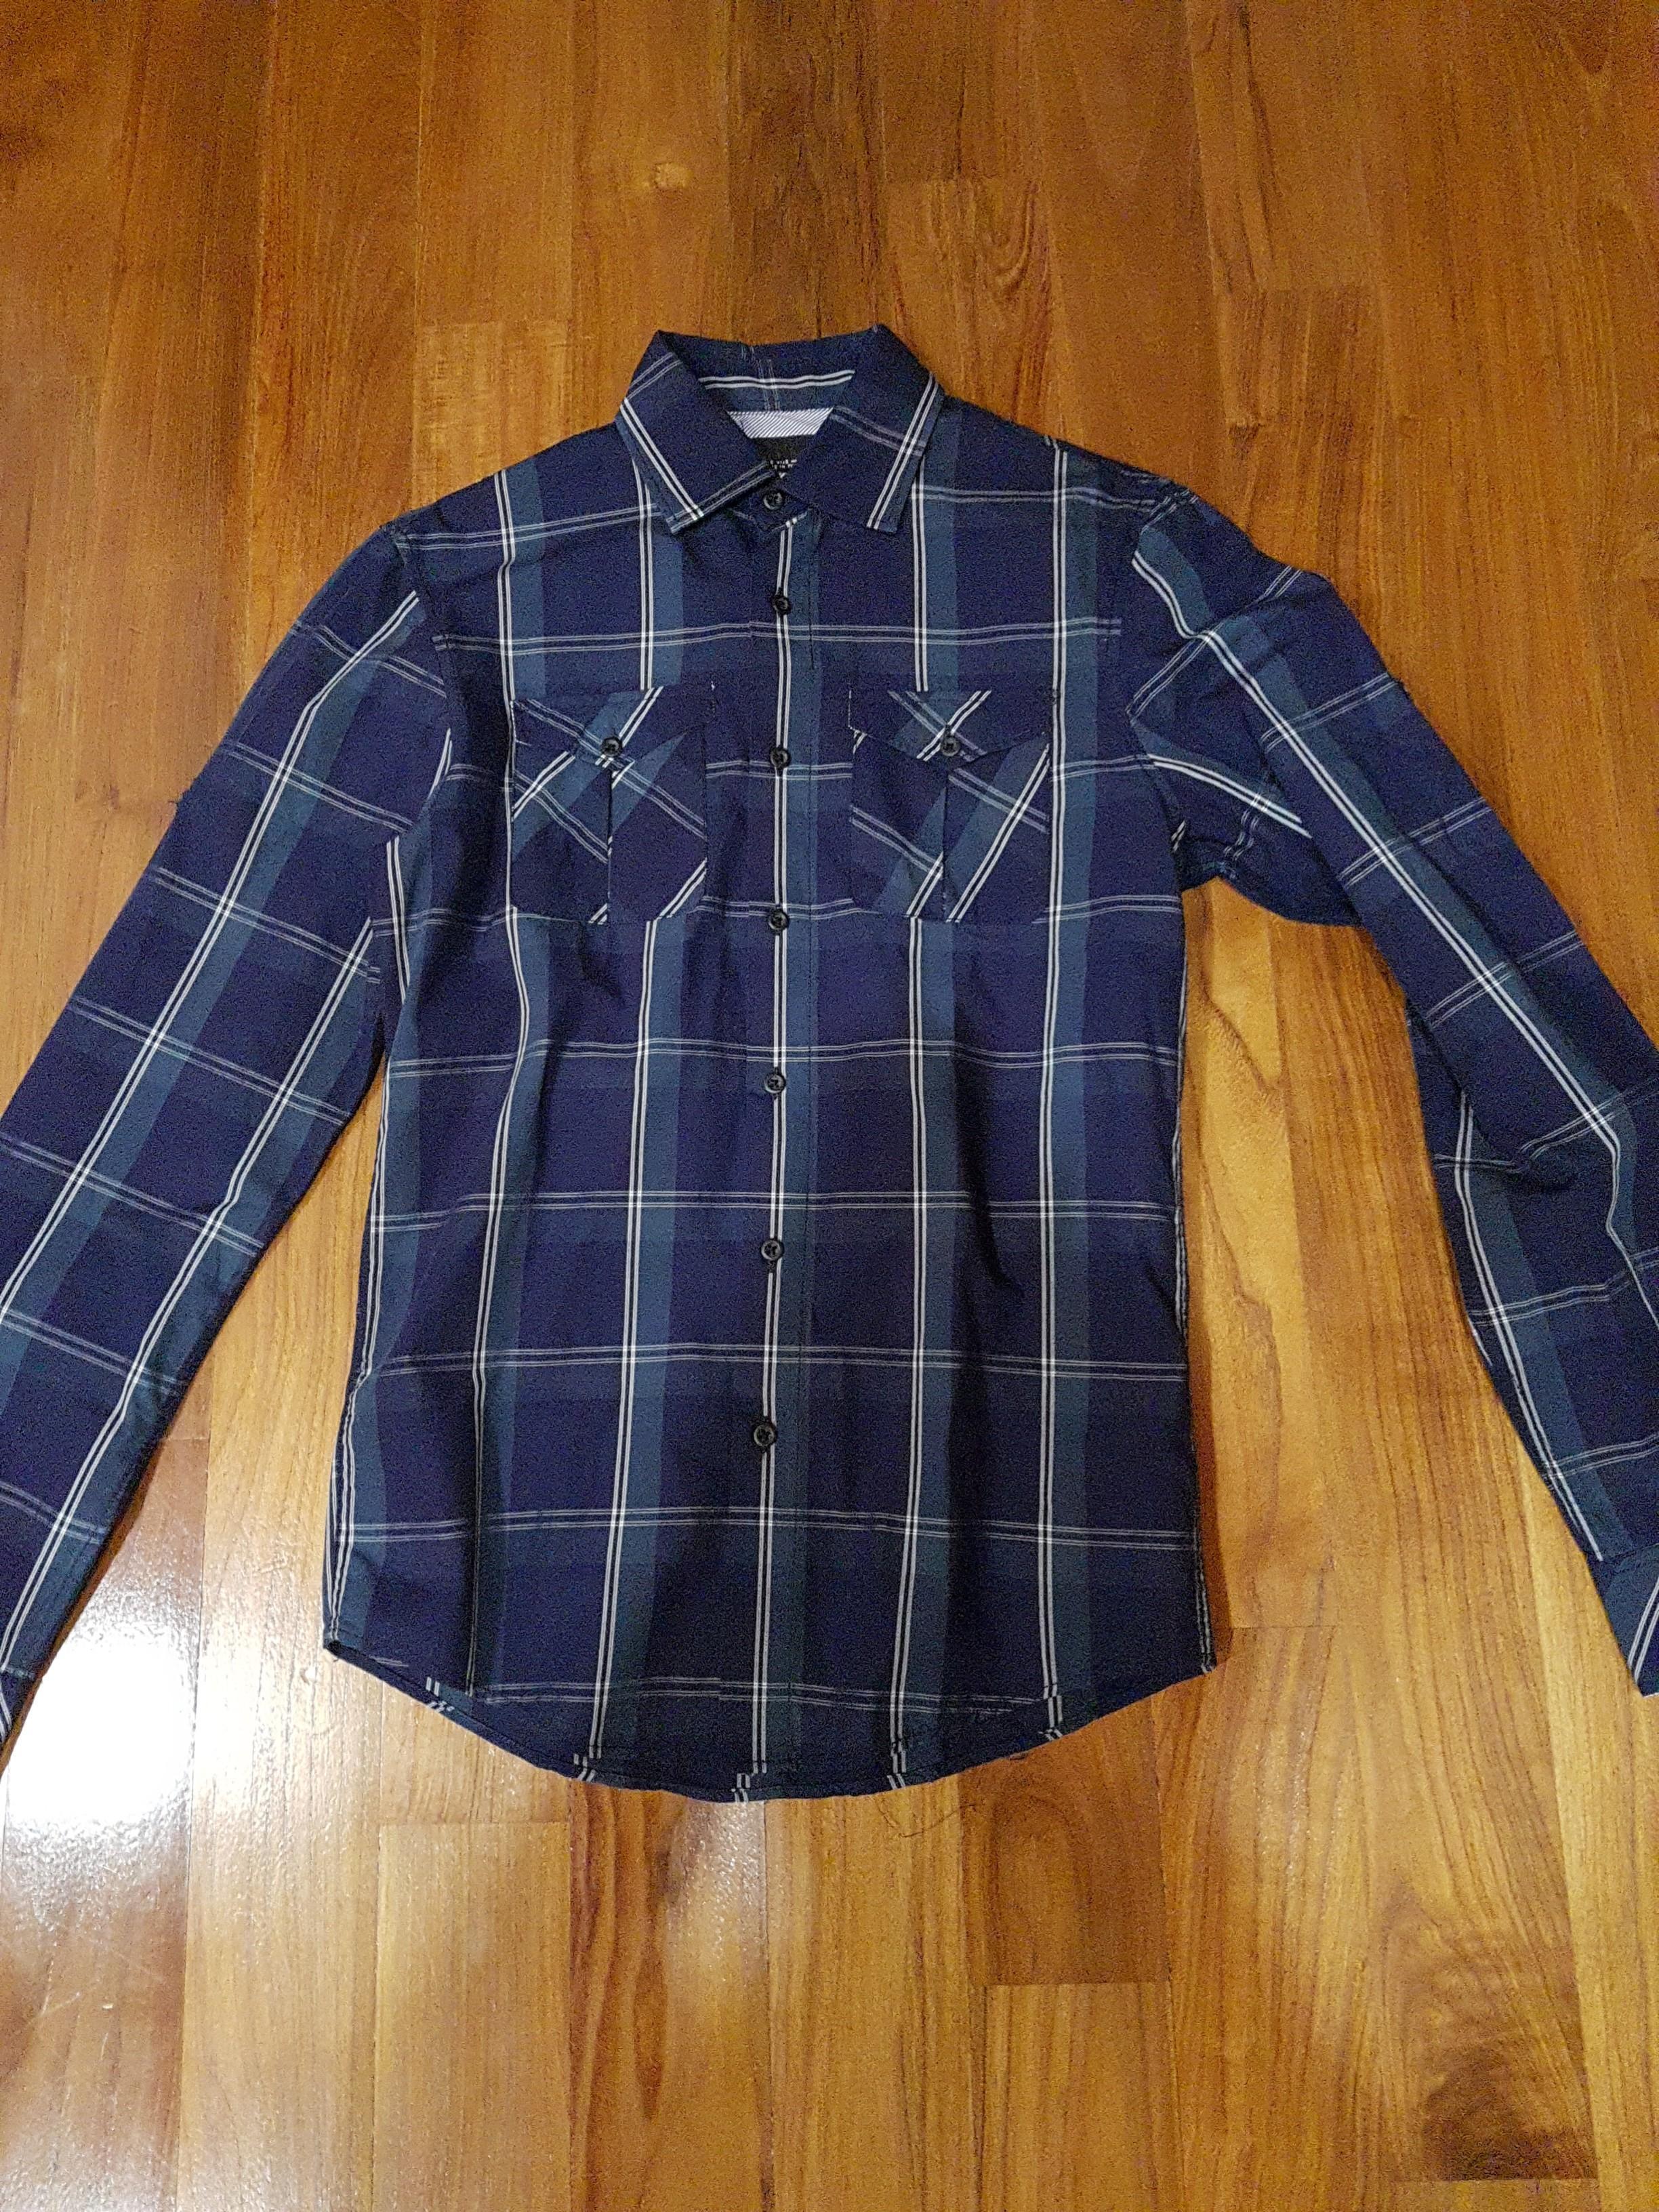 Zara Original Shirt Kemeja (S)